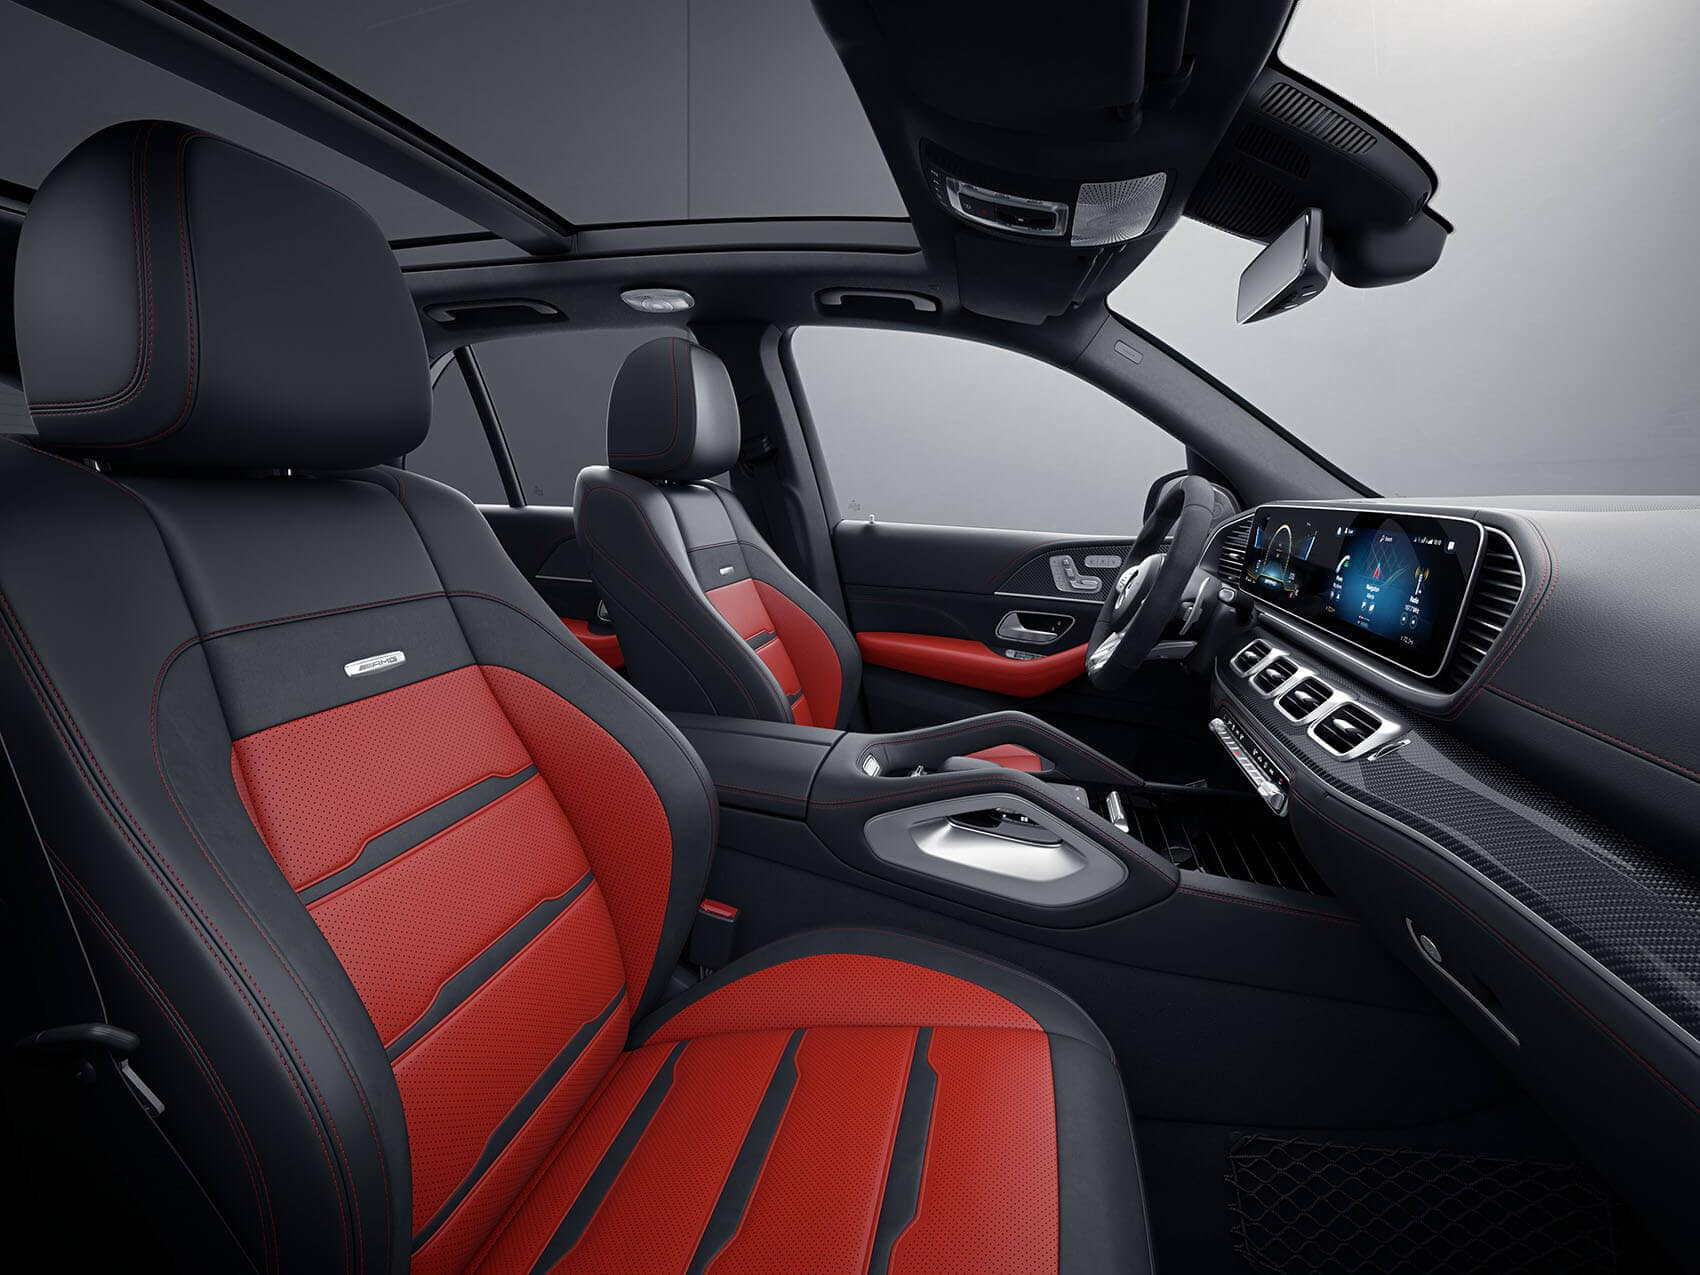 Mercedes-Benz GLE Interior Red